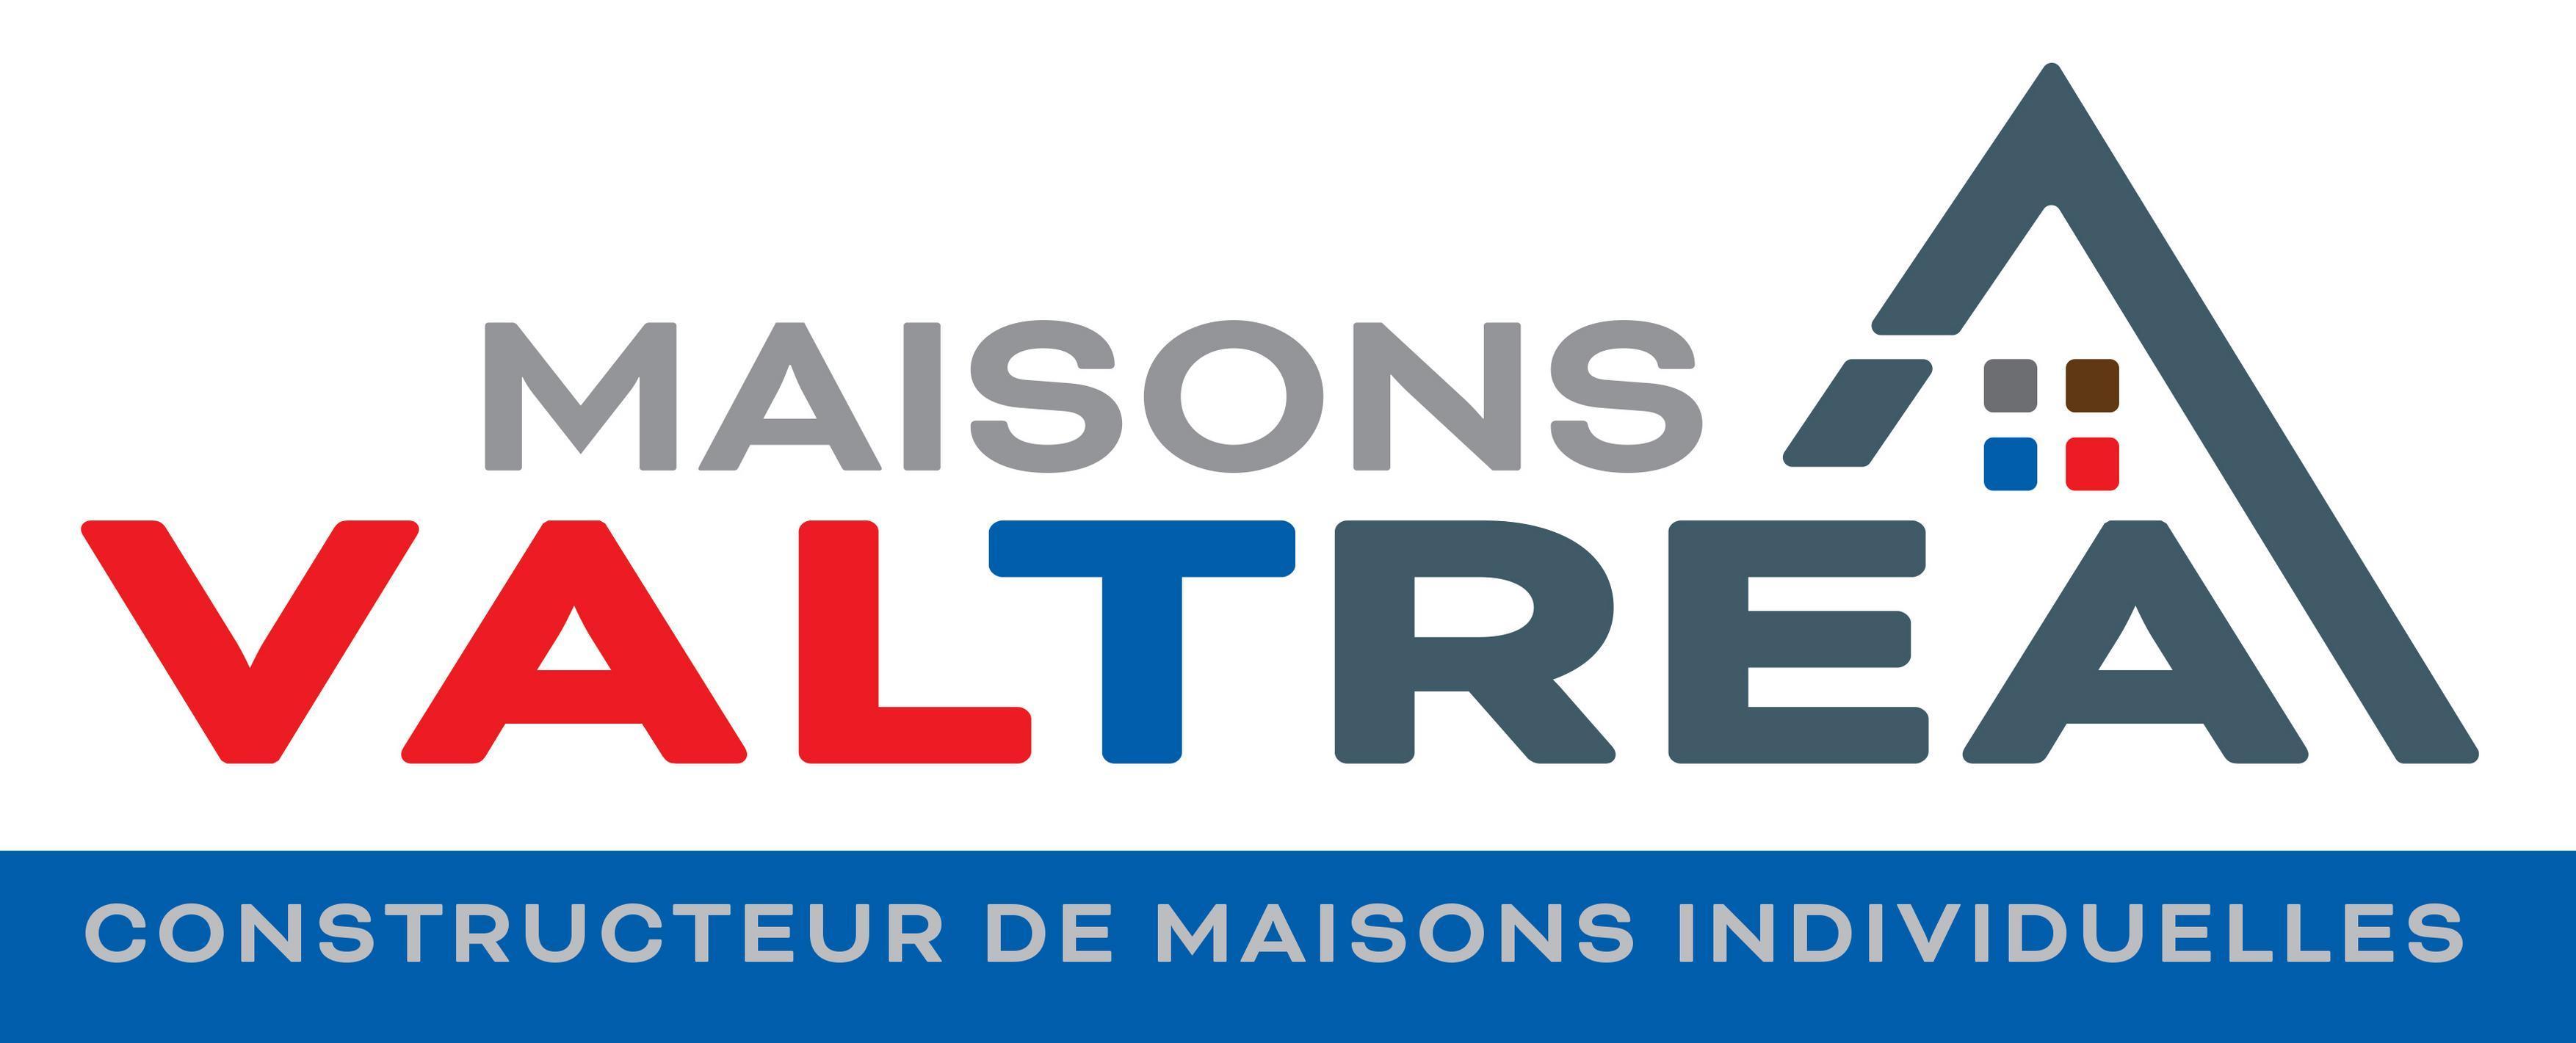 MAISONS VALTREA agence immobilière Château-Gaillard (01500)